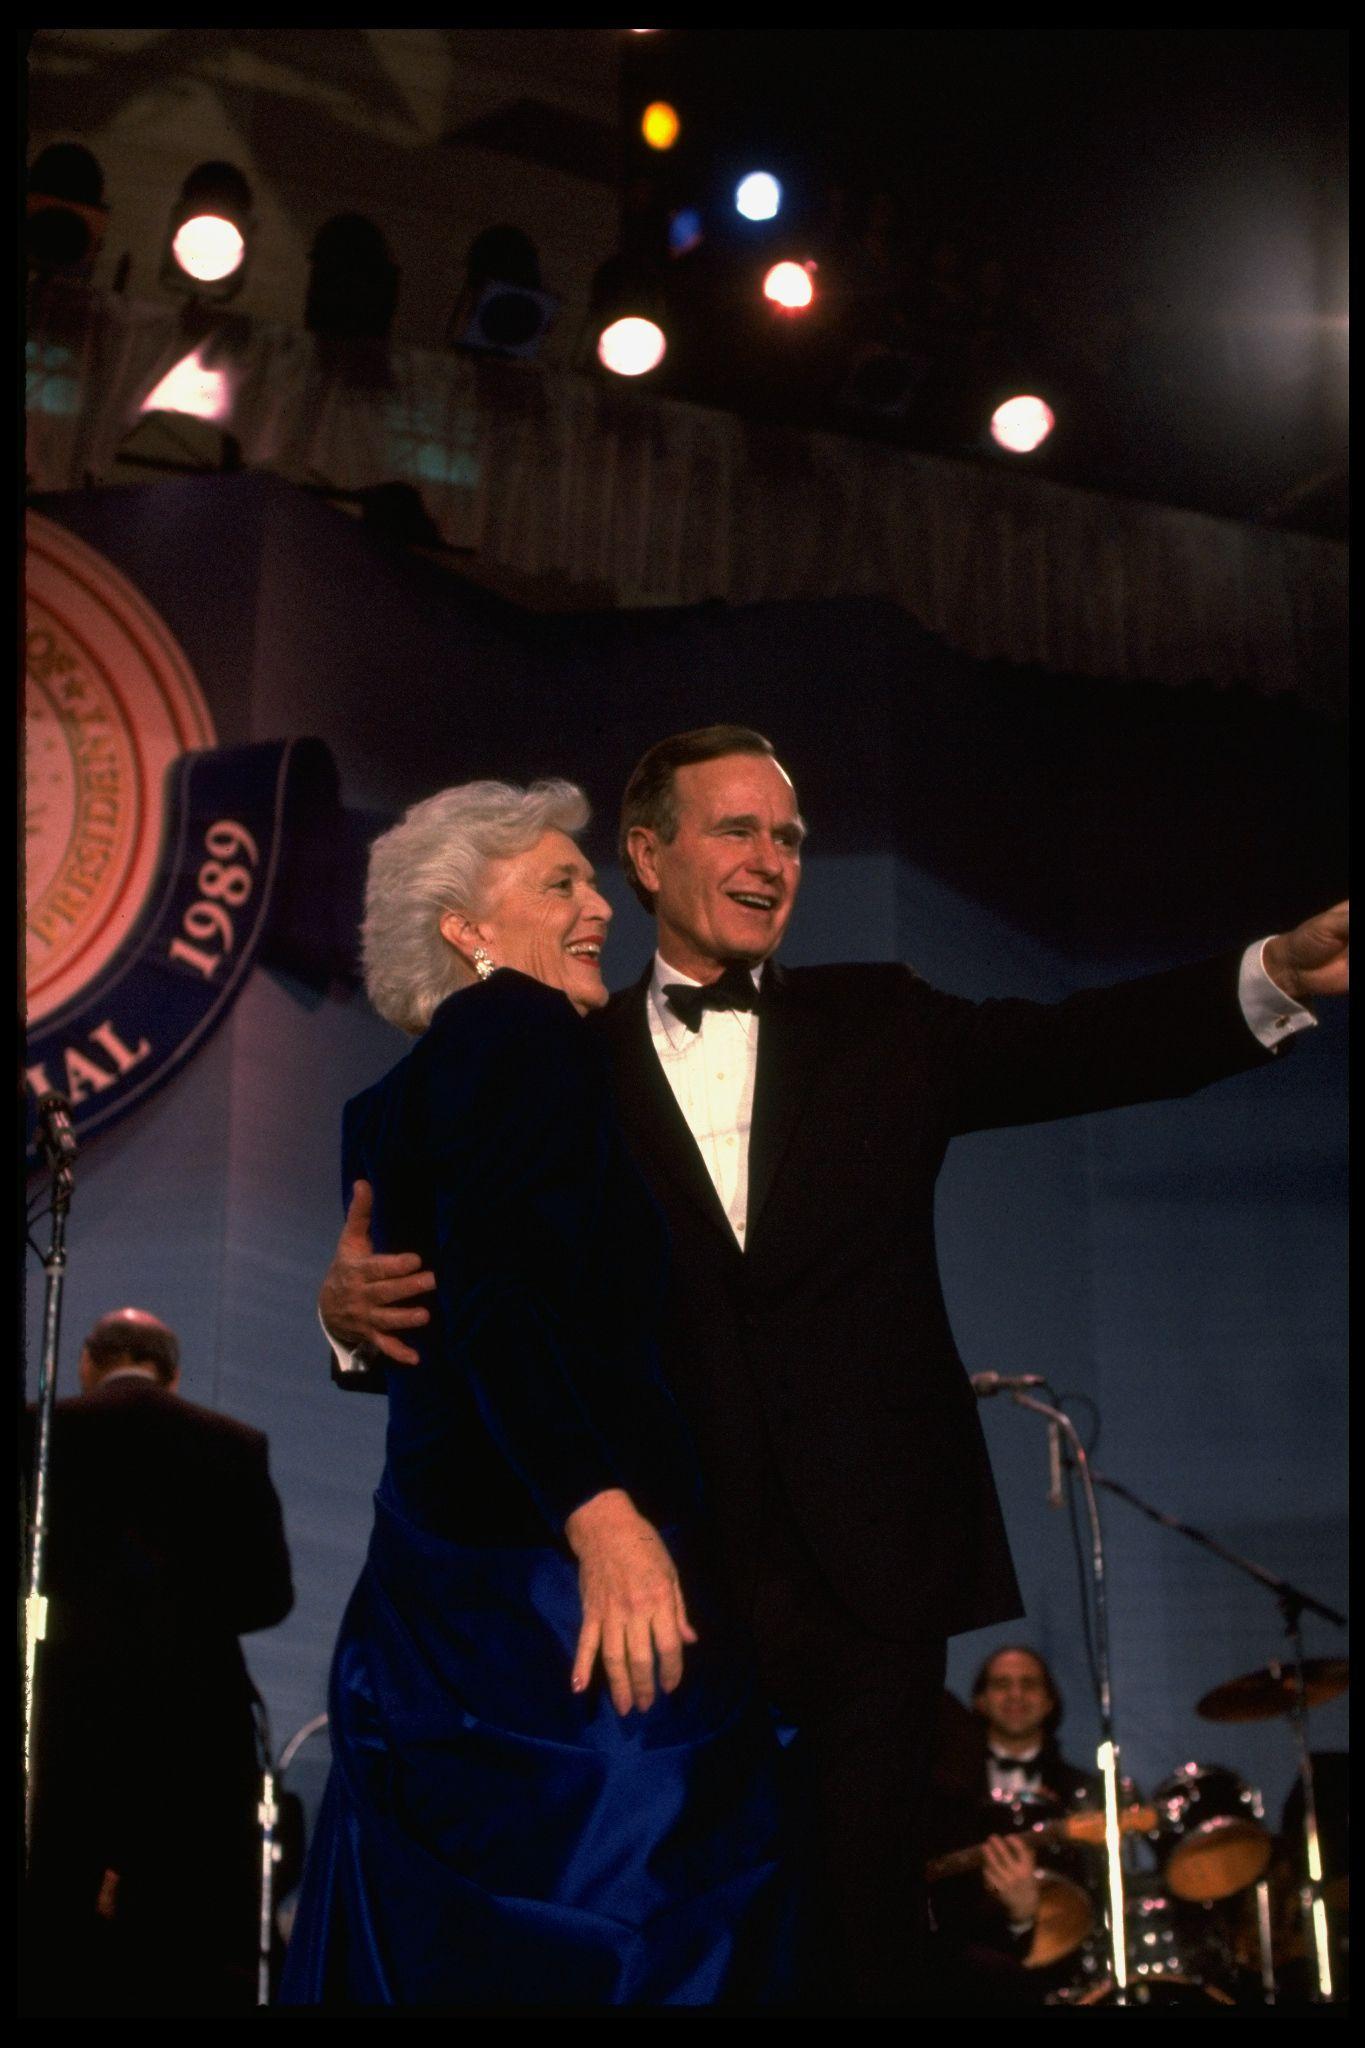 1989 inauguration ballbarbara bush and george h.w. bush